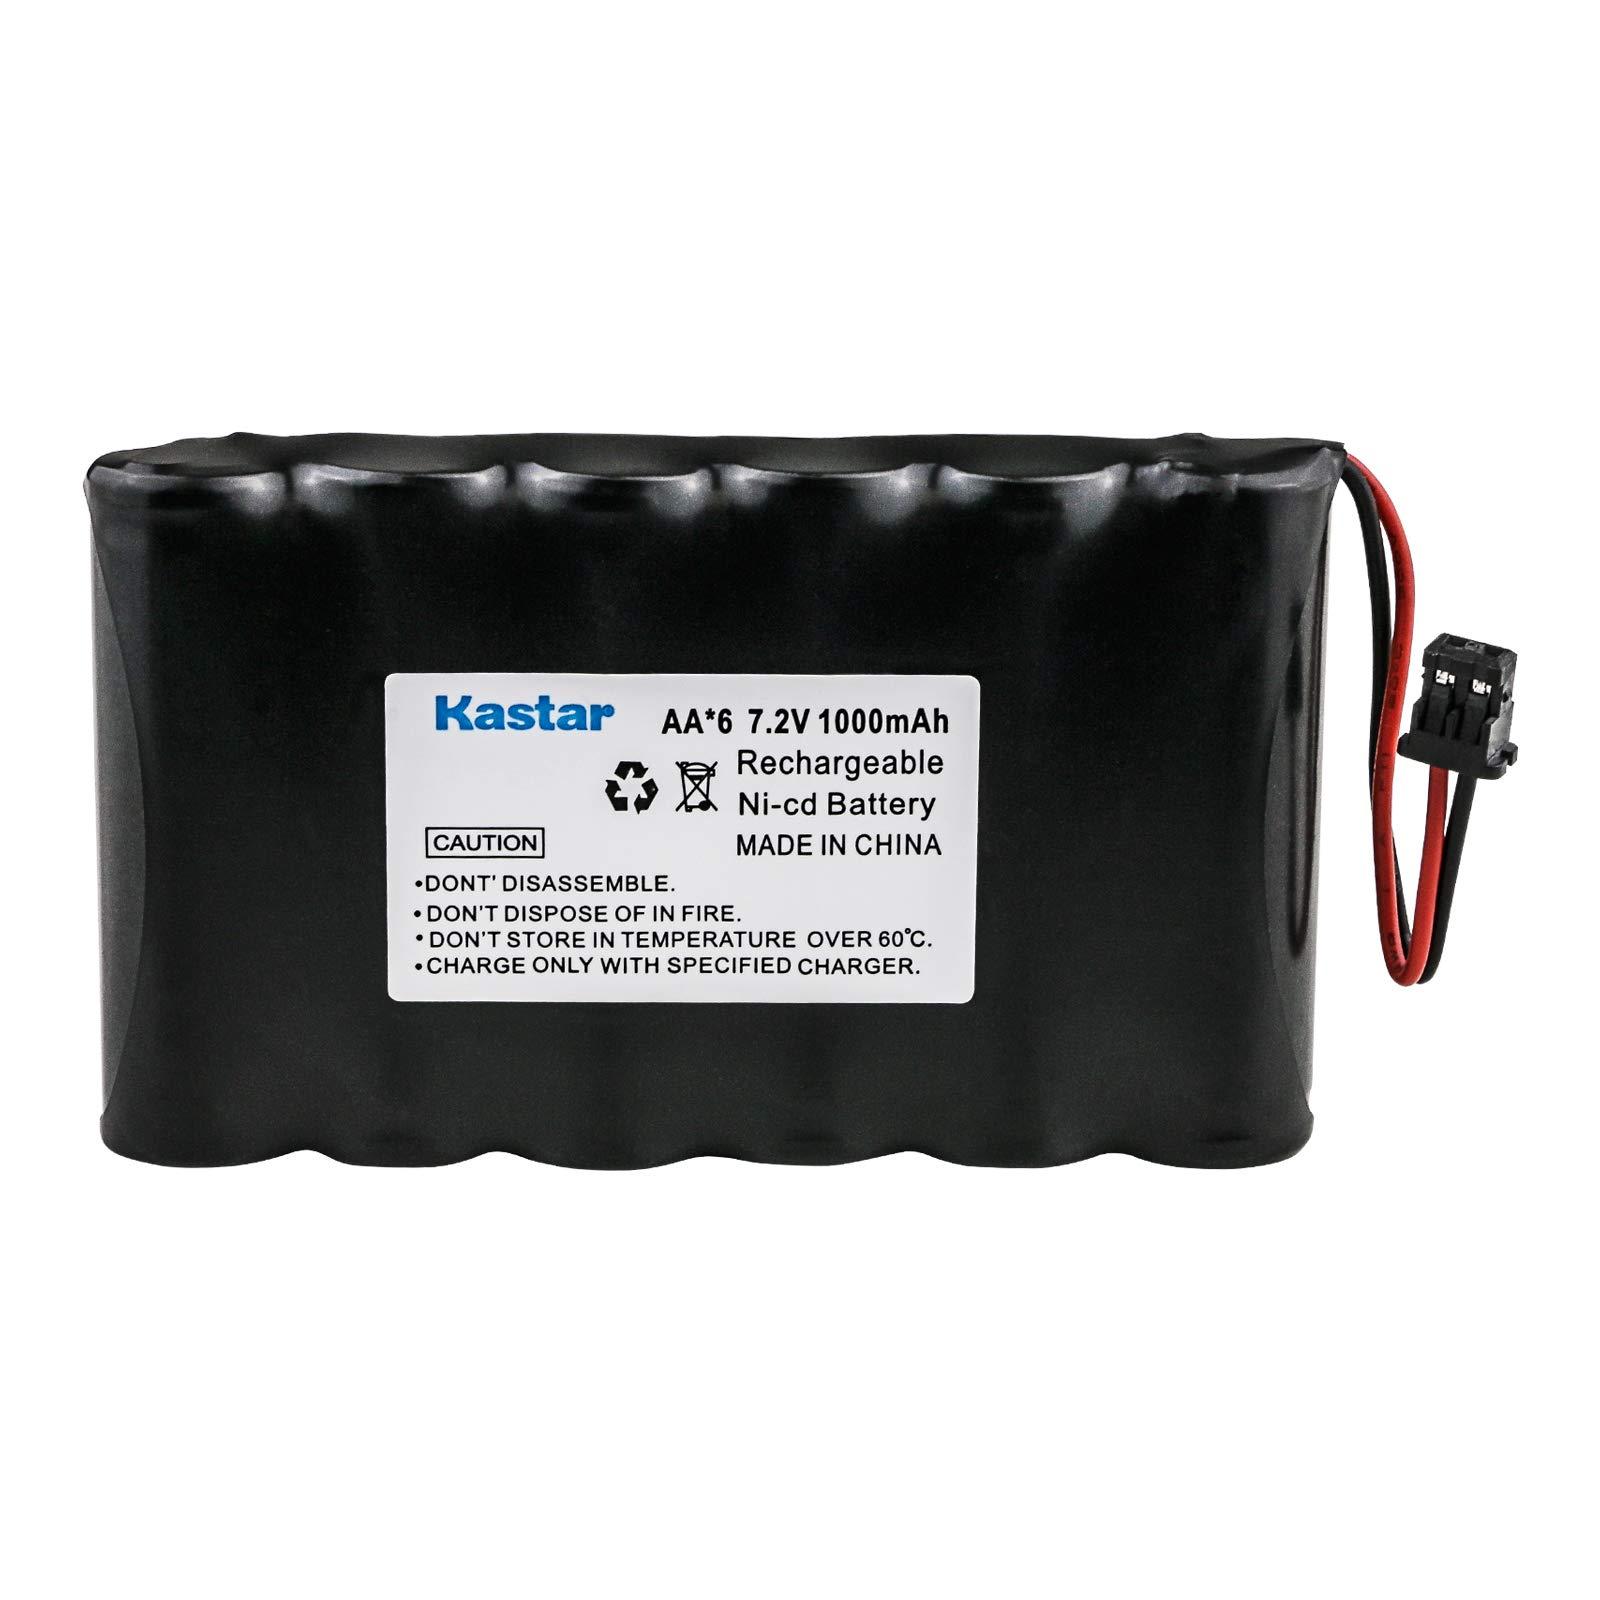 Panasonic PQP50AA61 Cordless Phone Battery Ni-CD, 7.2 Volt, 500 mAh - Ultra Hi-Capacity - Replacement for Panasonic HHR-P401, PANASONIC P-P507, TYPE 18 Rechargeable Battery